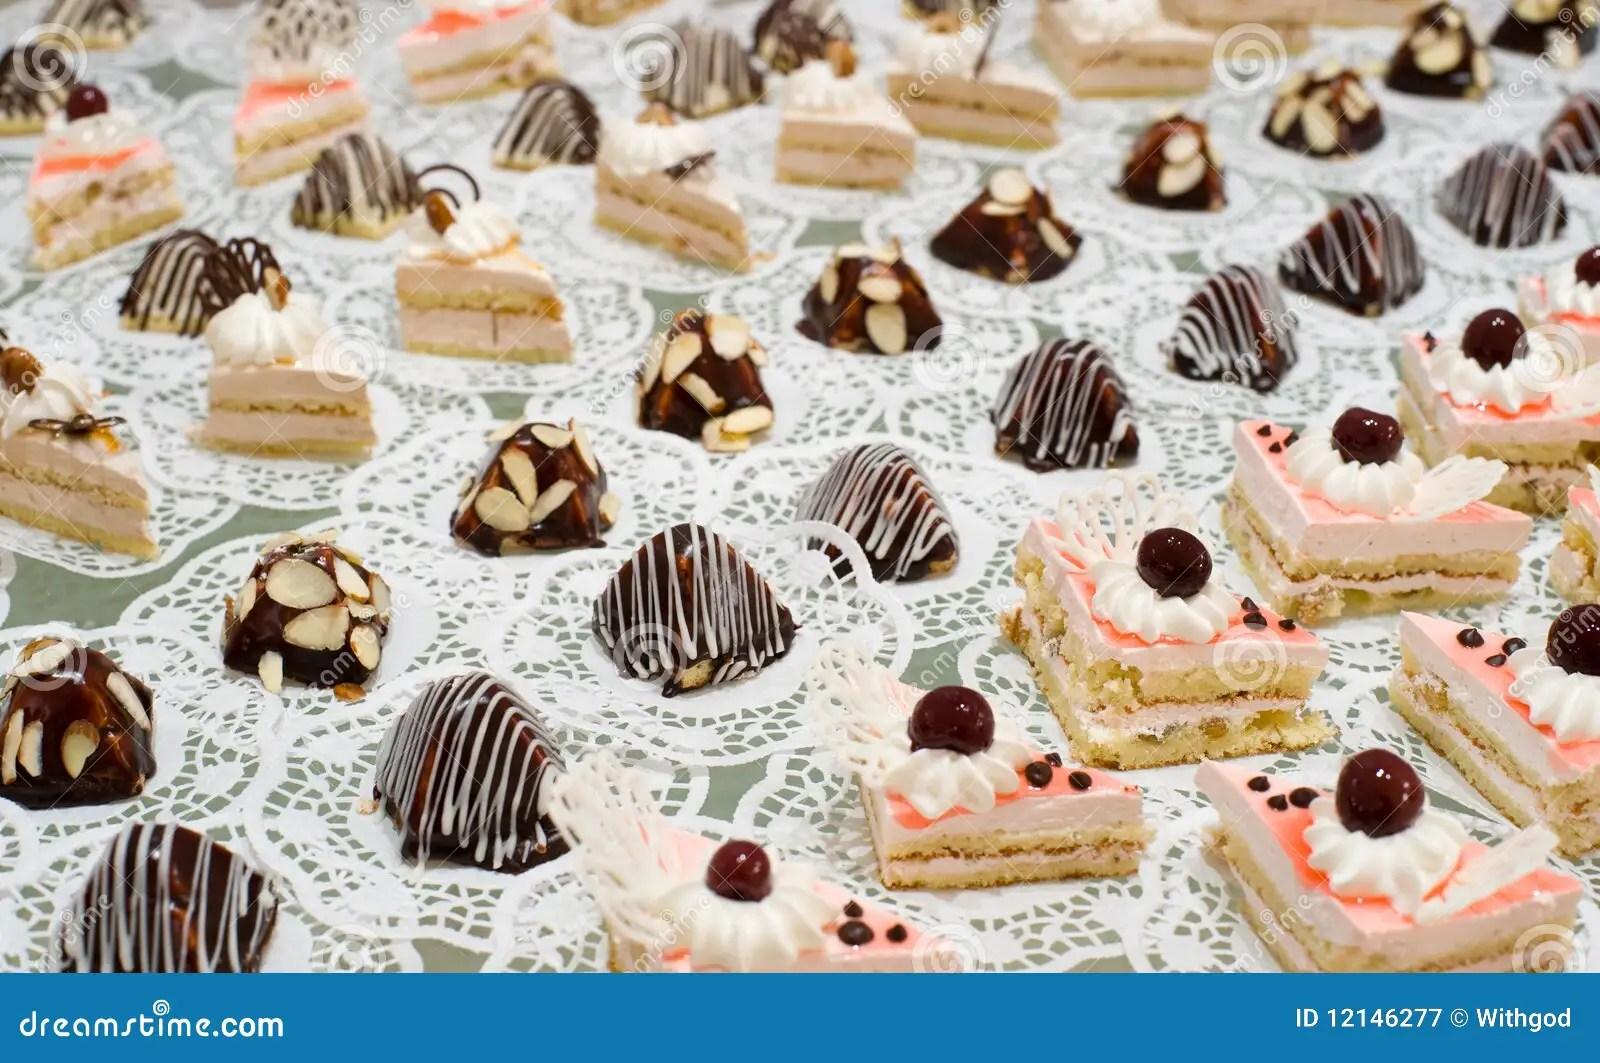 Buffet Table Dessert Stock Image Image Of Dessert Stand